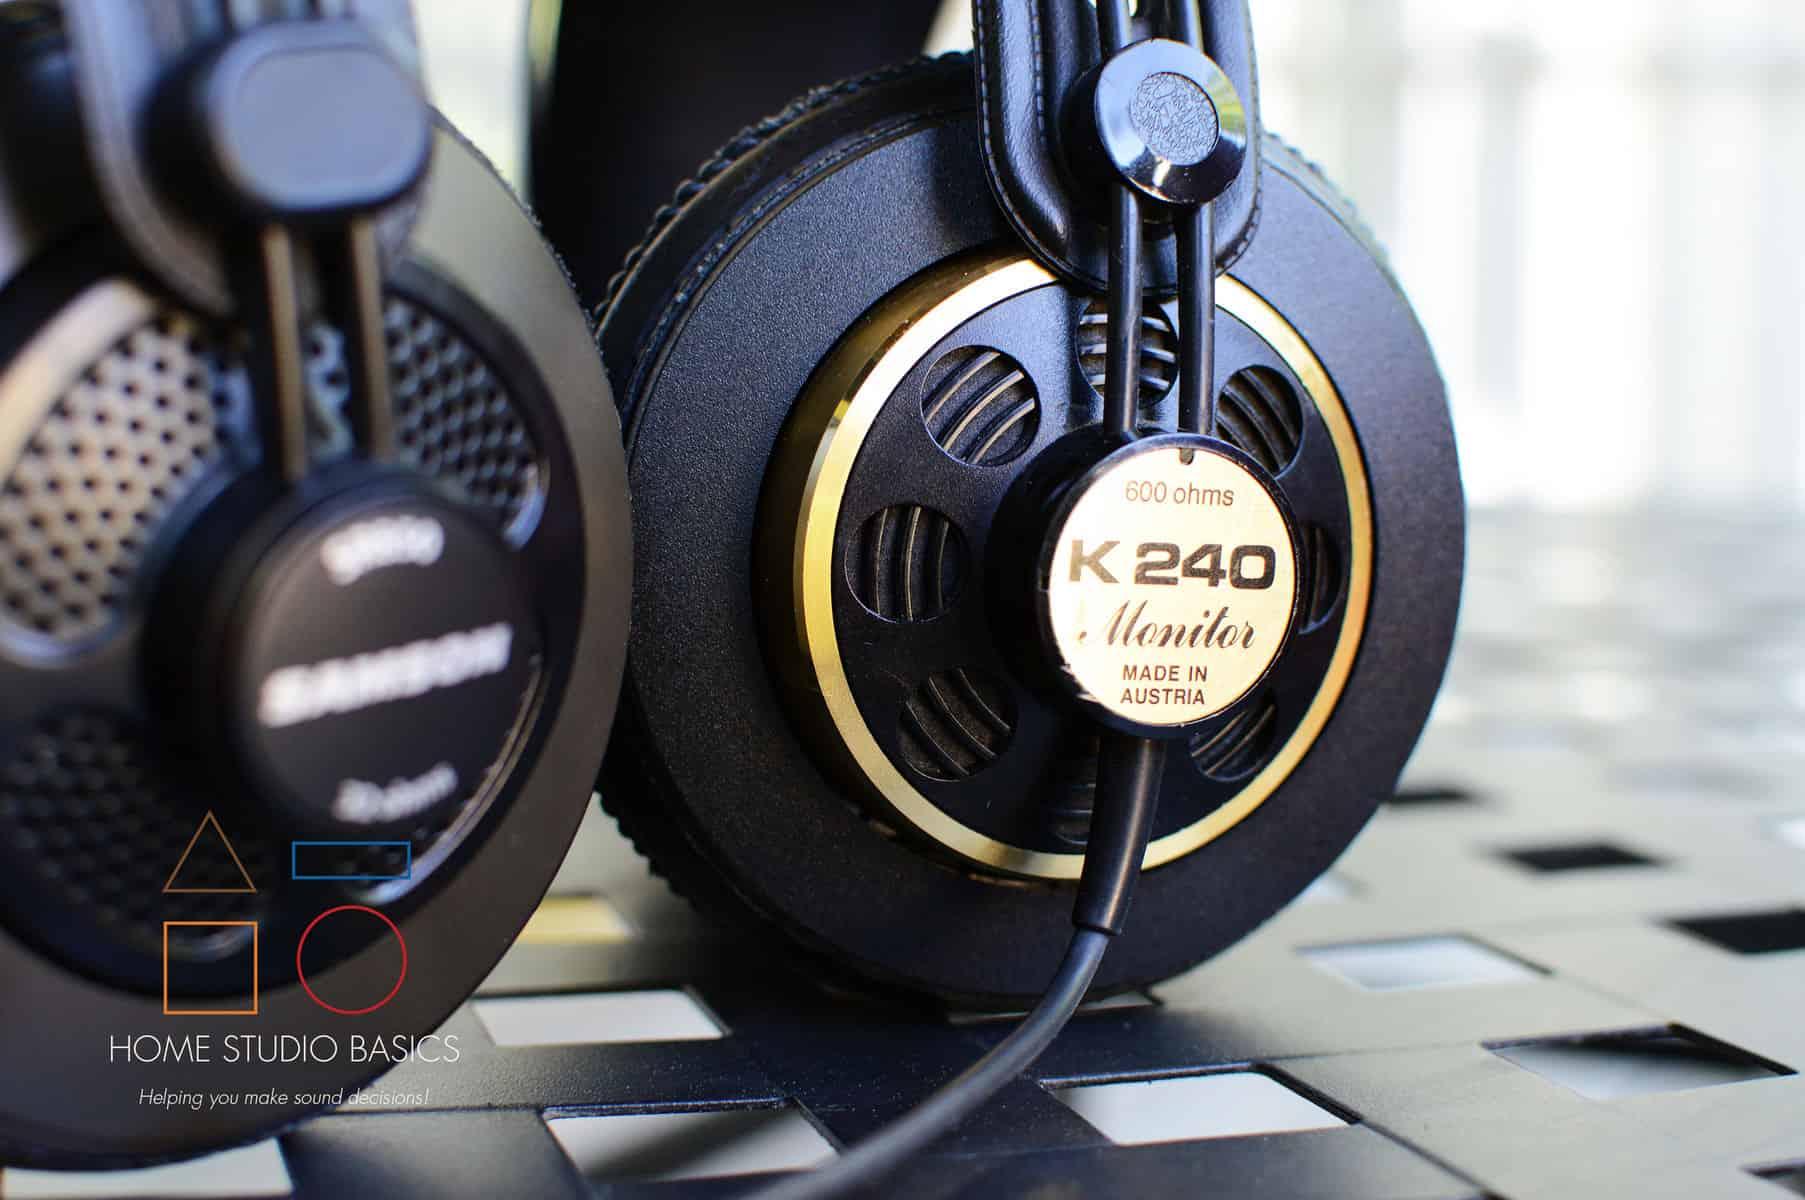 AKG K240 vs. K240 MK II